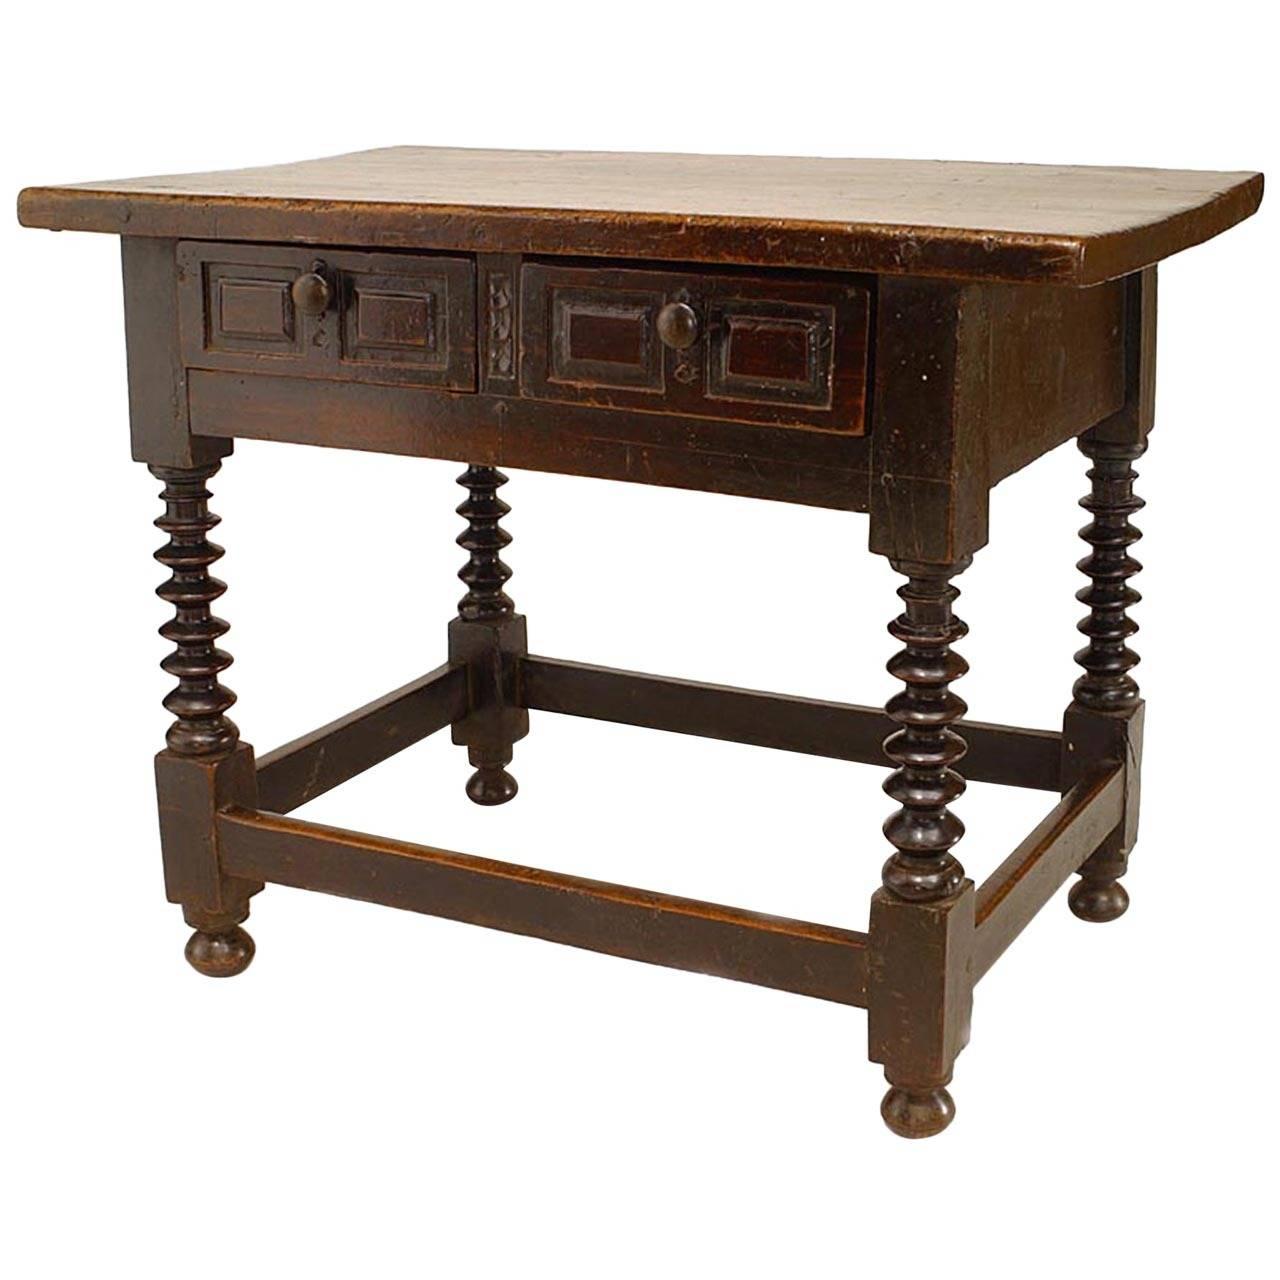 17th c. English Renaissance Walnut Desk